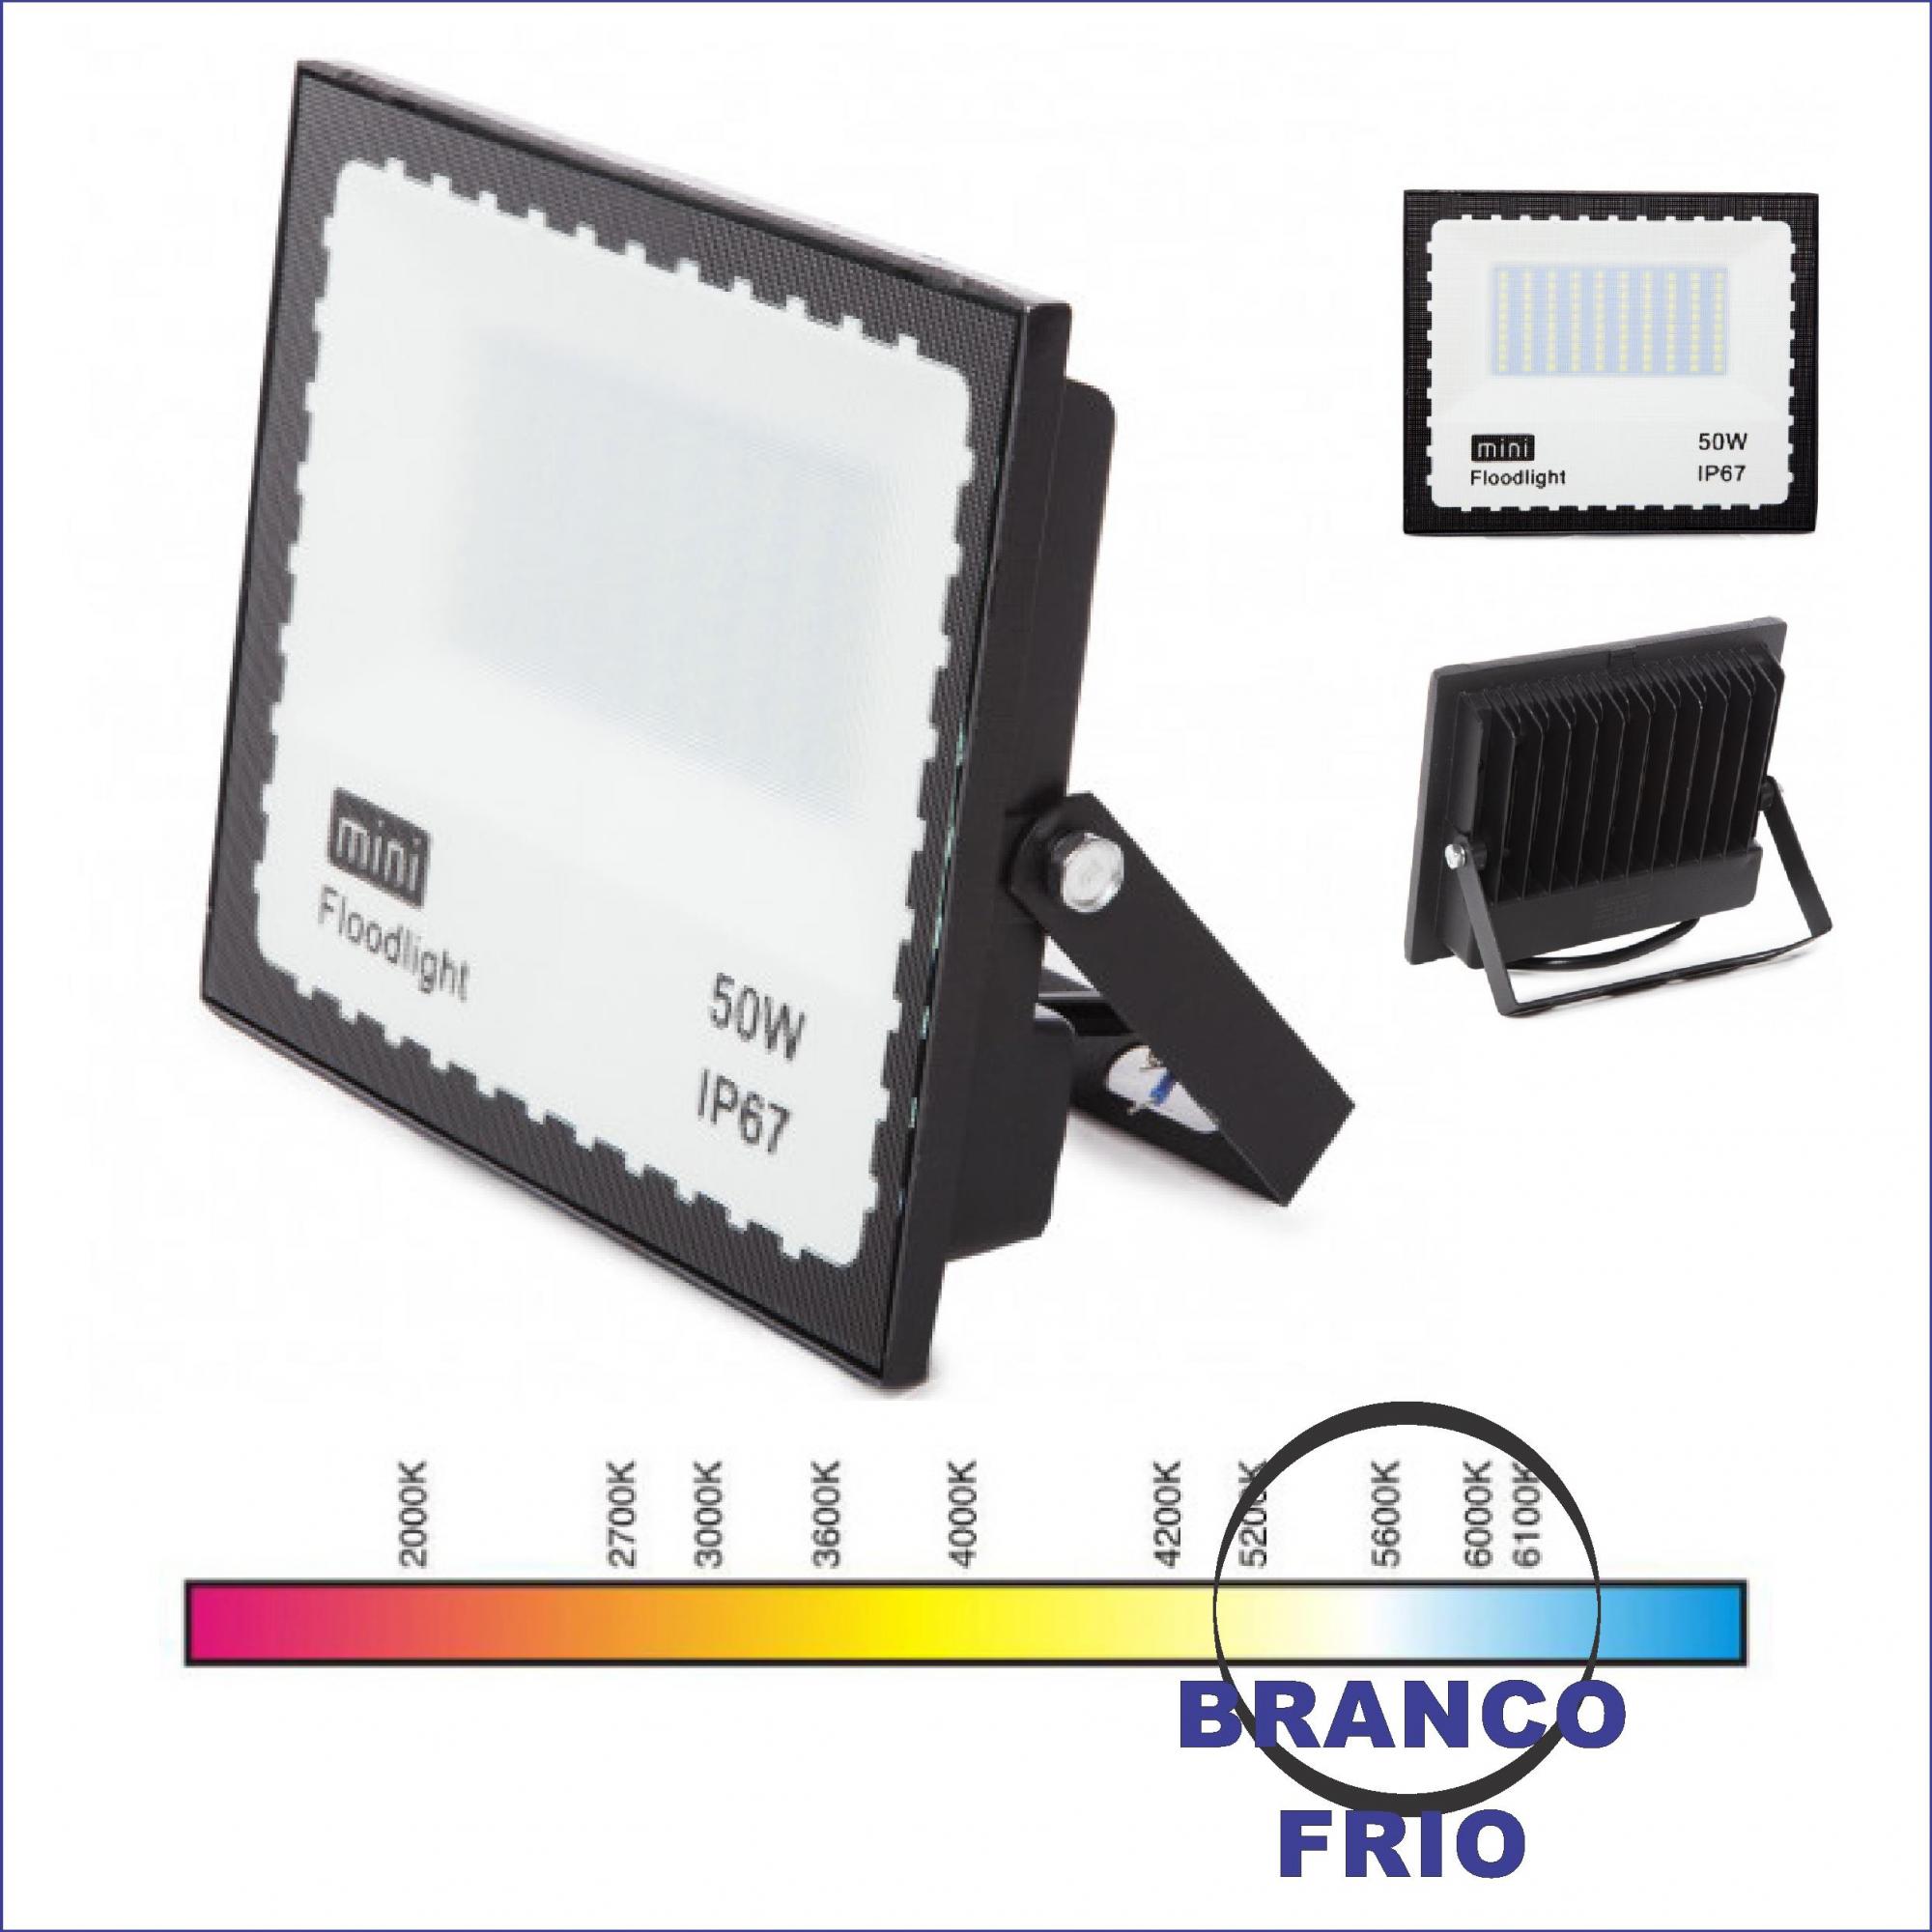 kIT 2 Refletores Holofote LED SMD 50W Branco Frio IP67